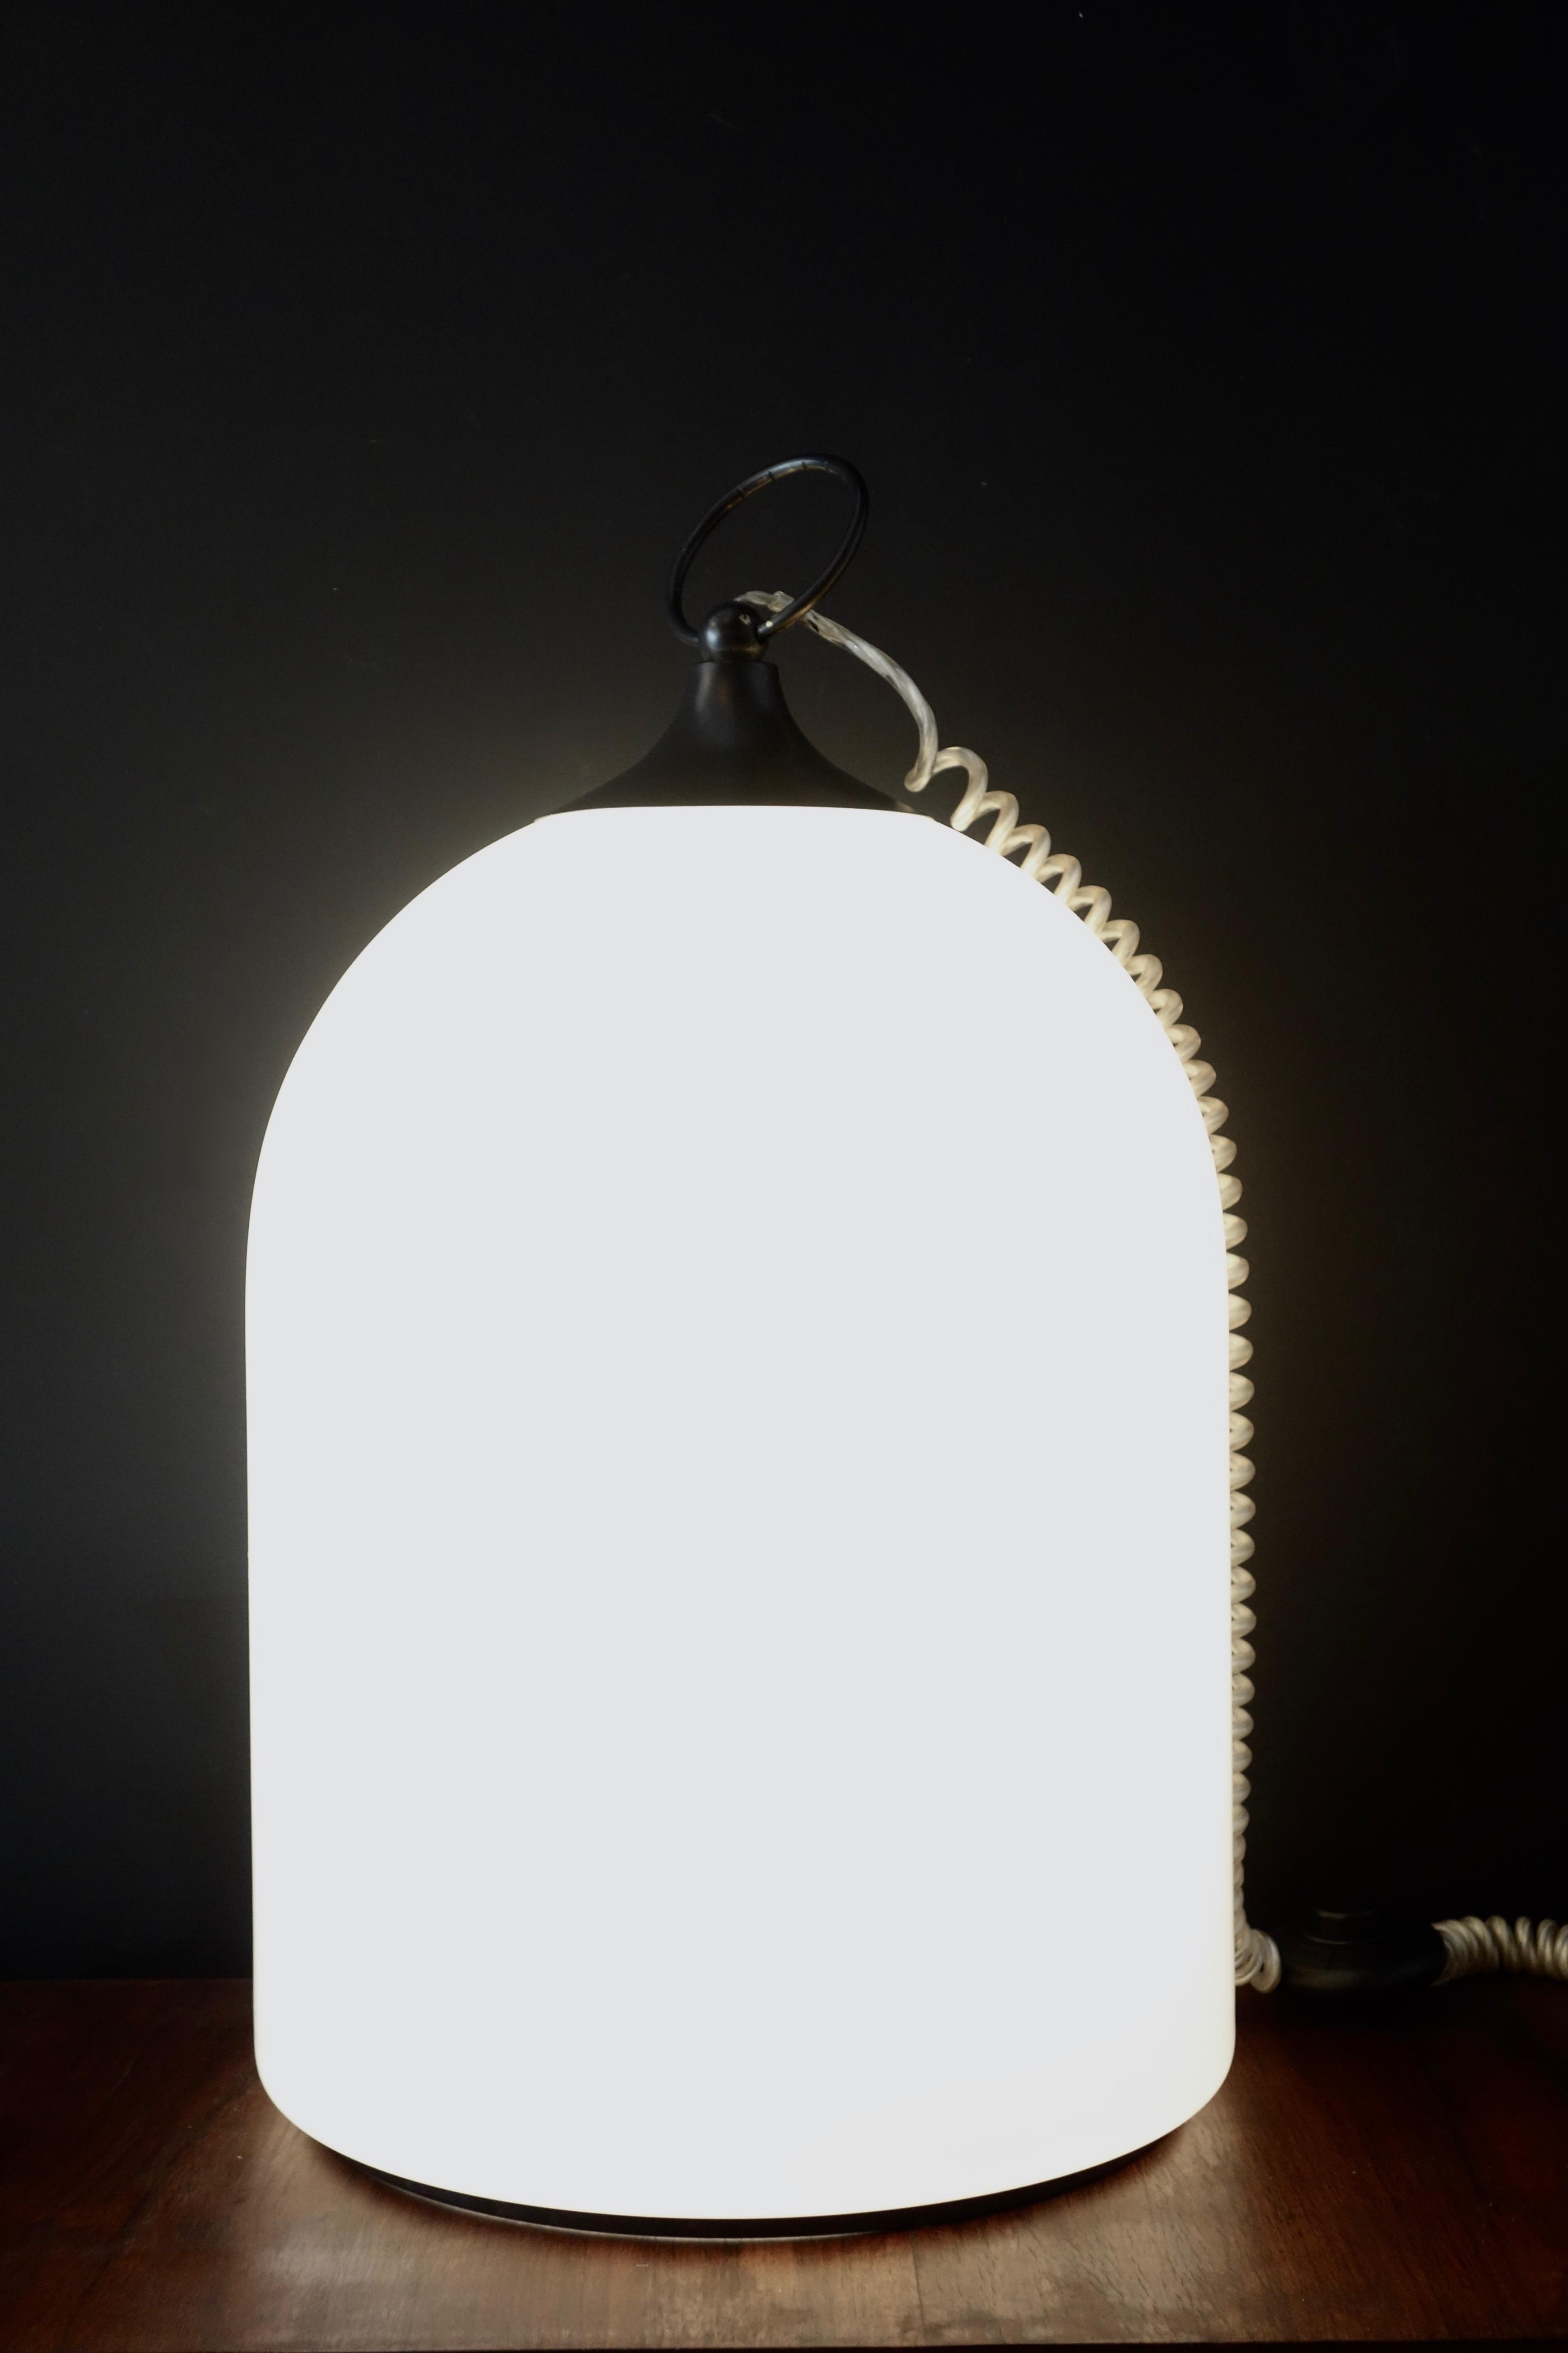 Lampe verre soufflé Murano année 80